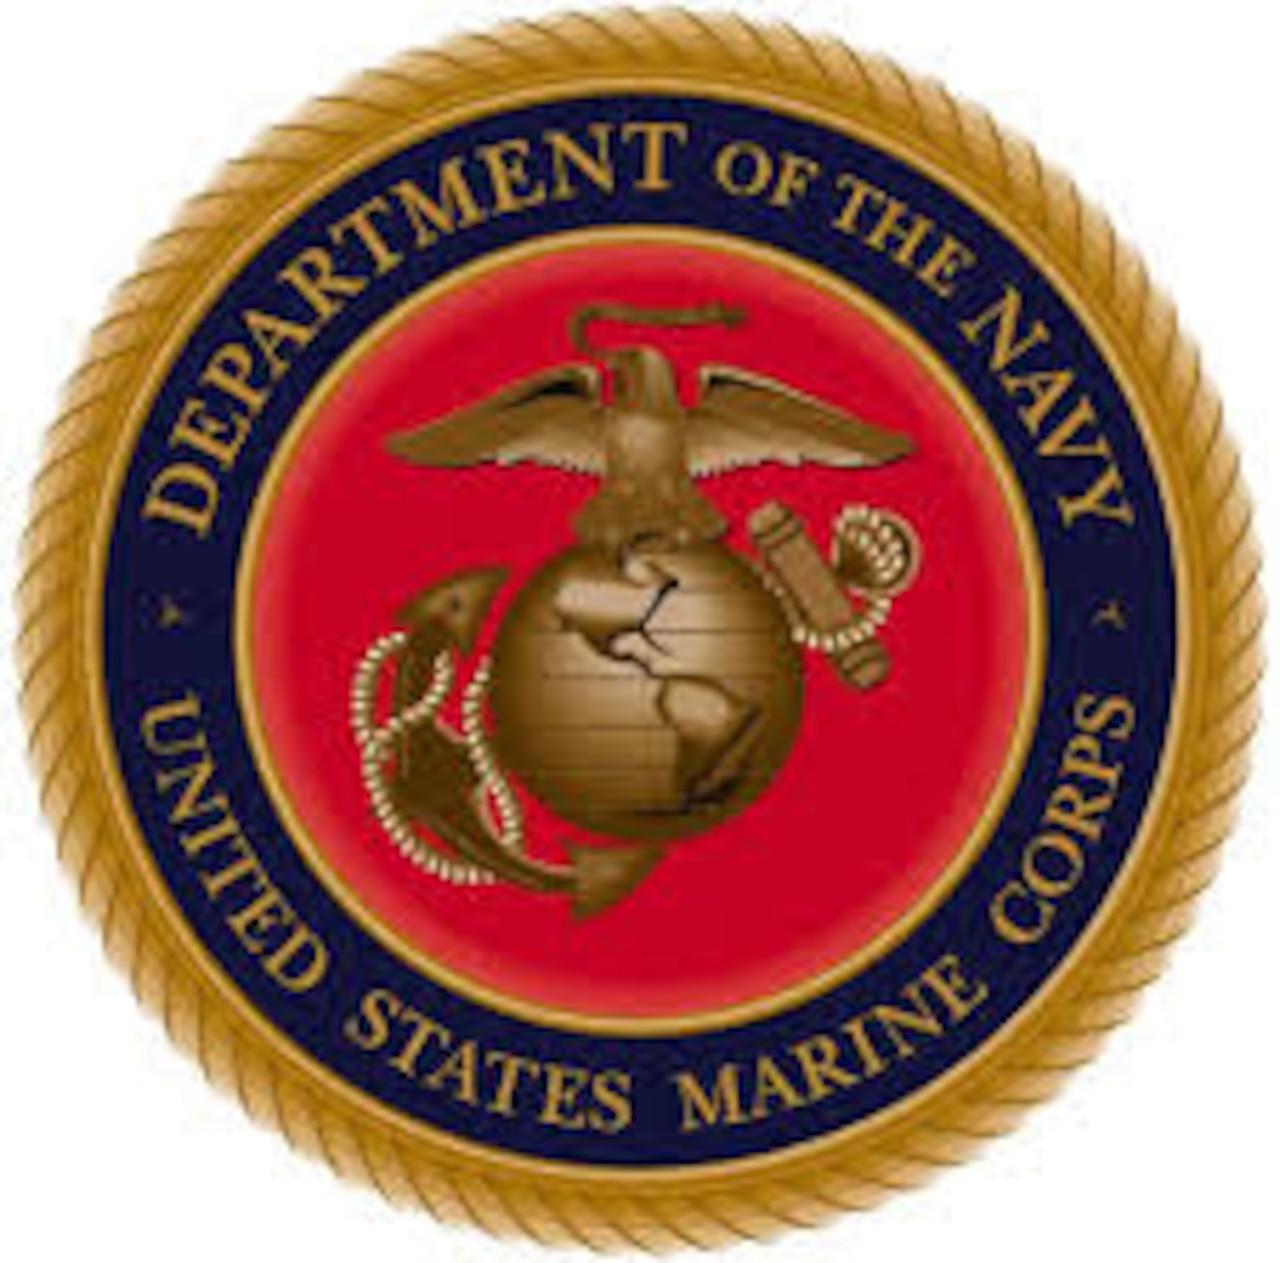 Marine Corps emblem.